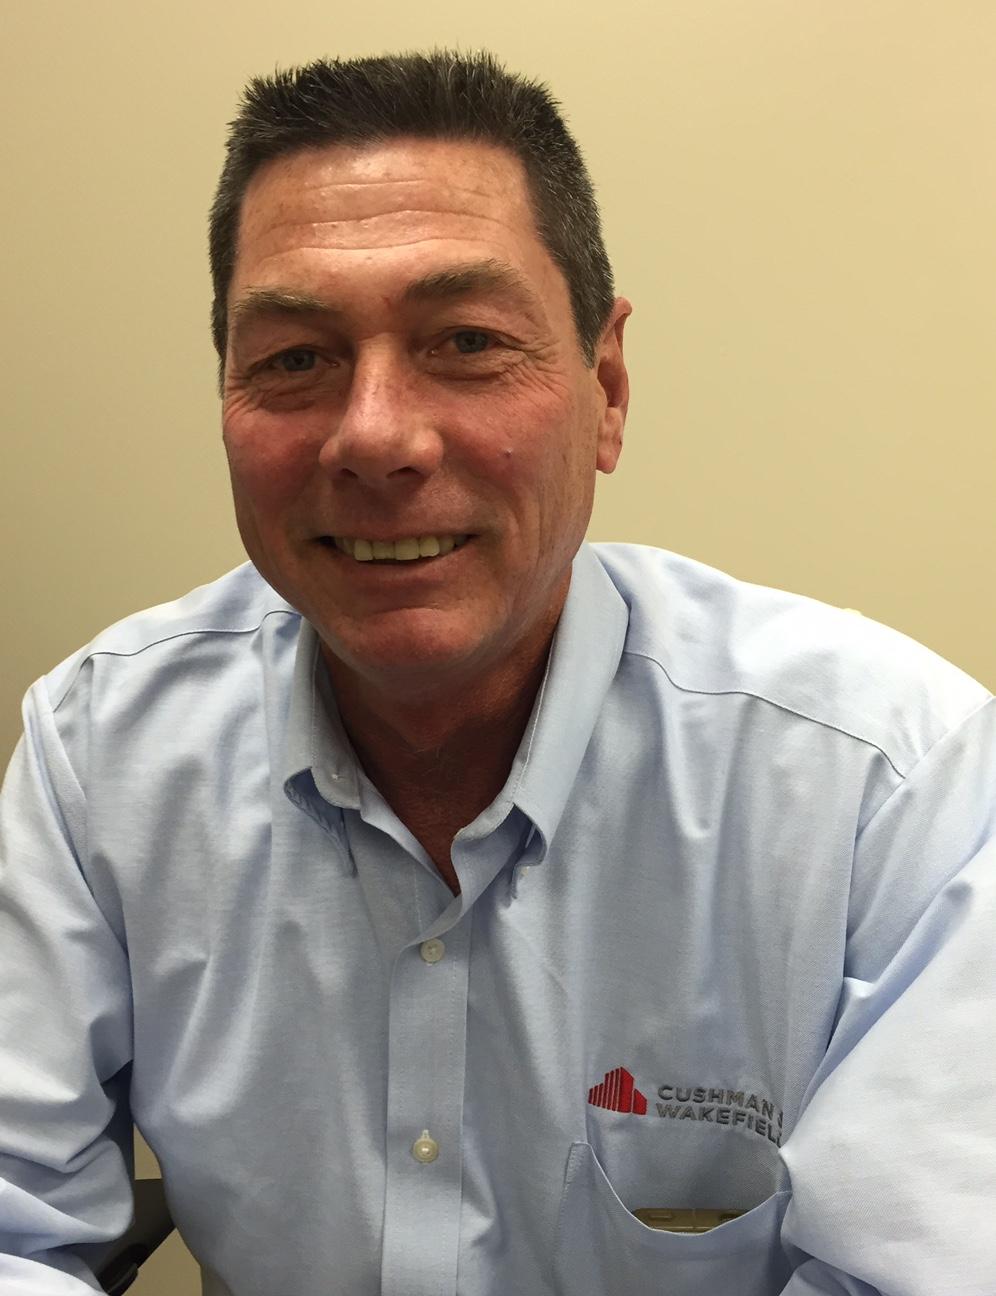 Spotlight on: Albert Whitecavage, Lead Operating Engineer, Cushman & Wakefield